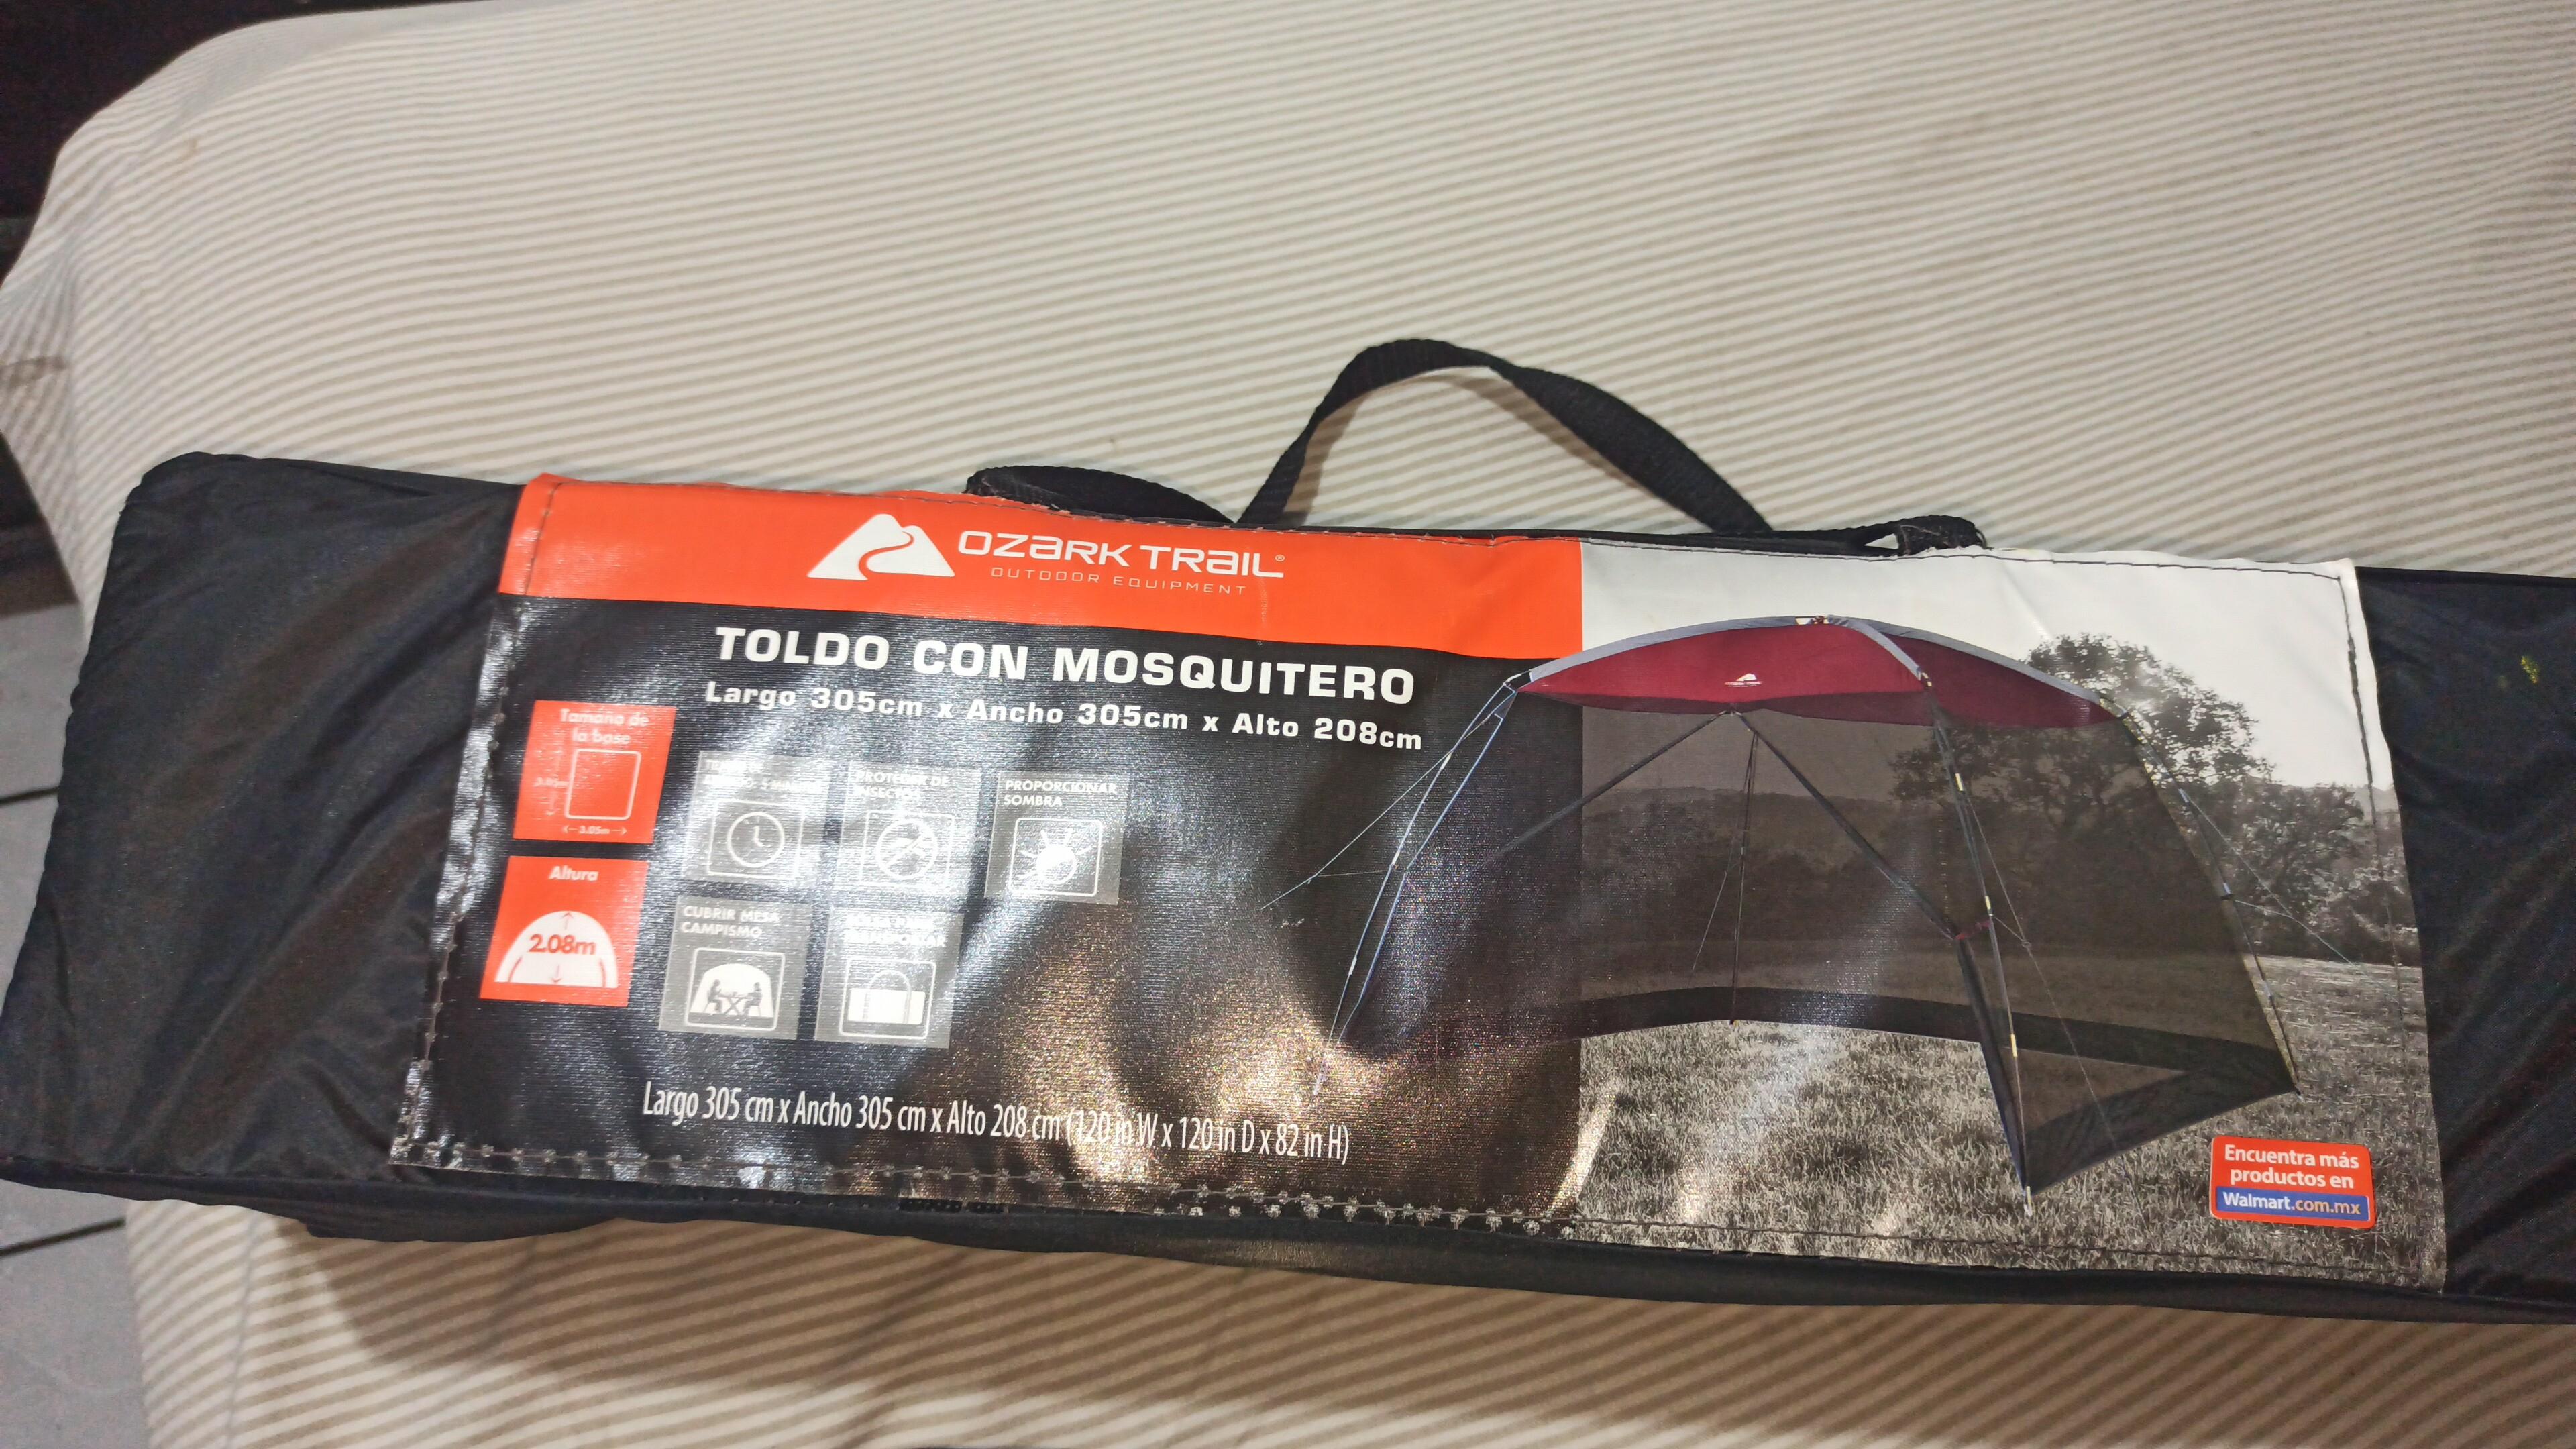 Walmart: Toldo mosquitero ozark